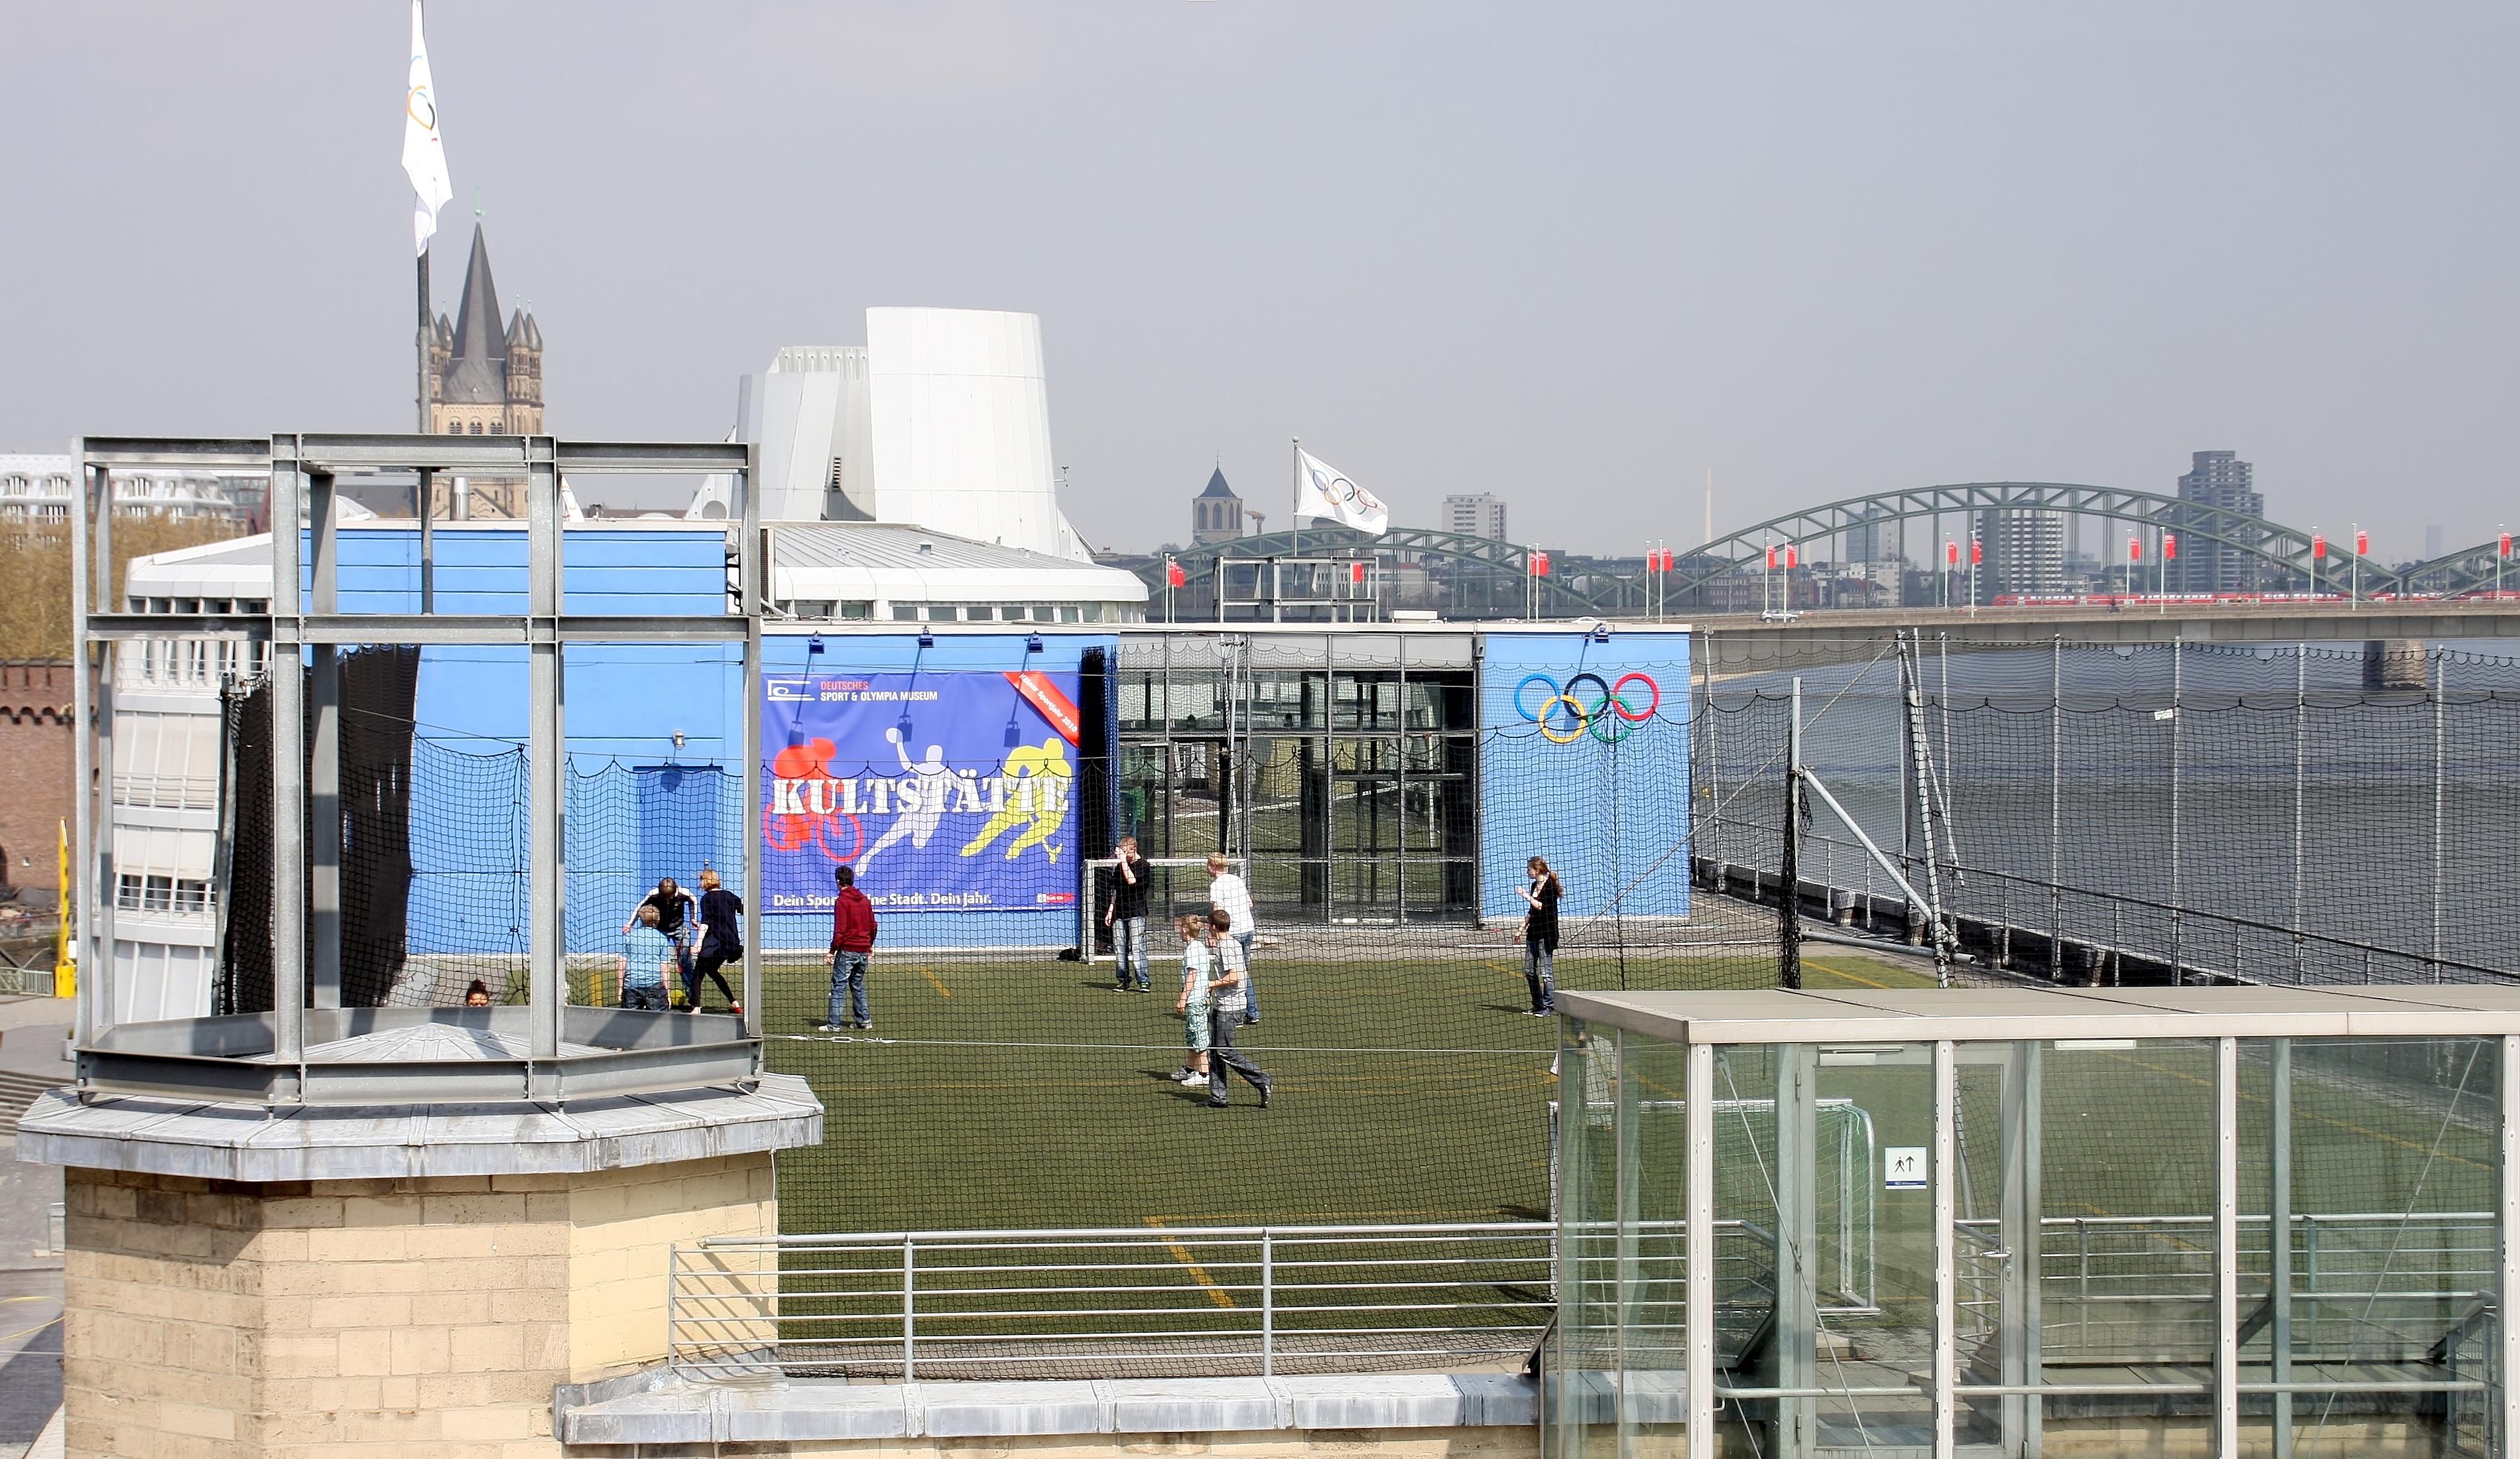 file rheinauhafen sport und olympiamuseum sportplatz auf dem dach 8734 jpg wikimedia